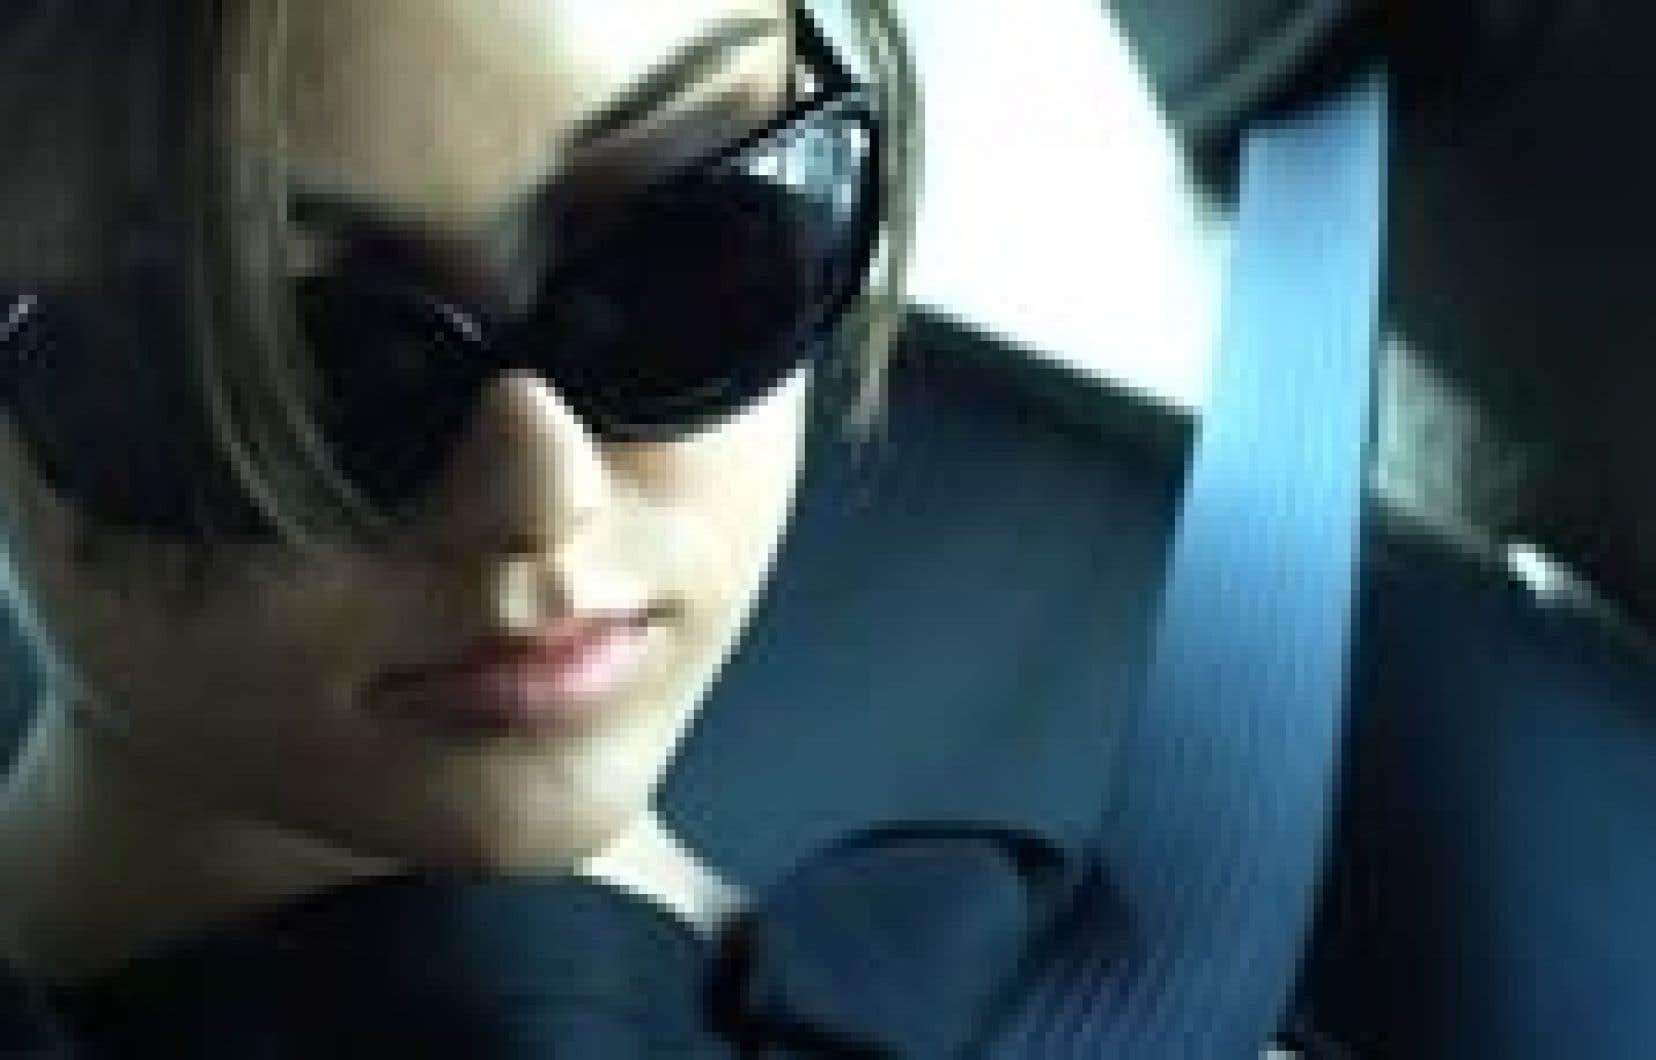 Sasha Grey, une star du porno, tient la vedette du dernier film de Steven Soderbergh, The Girlfriend Experience.